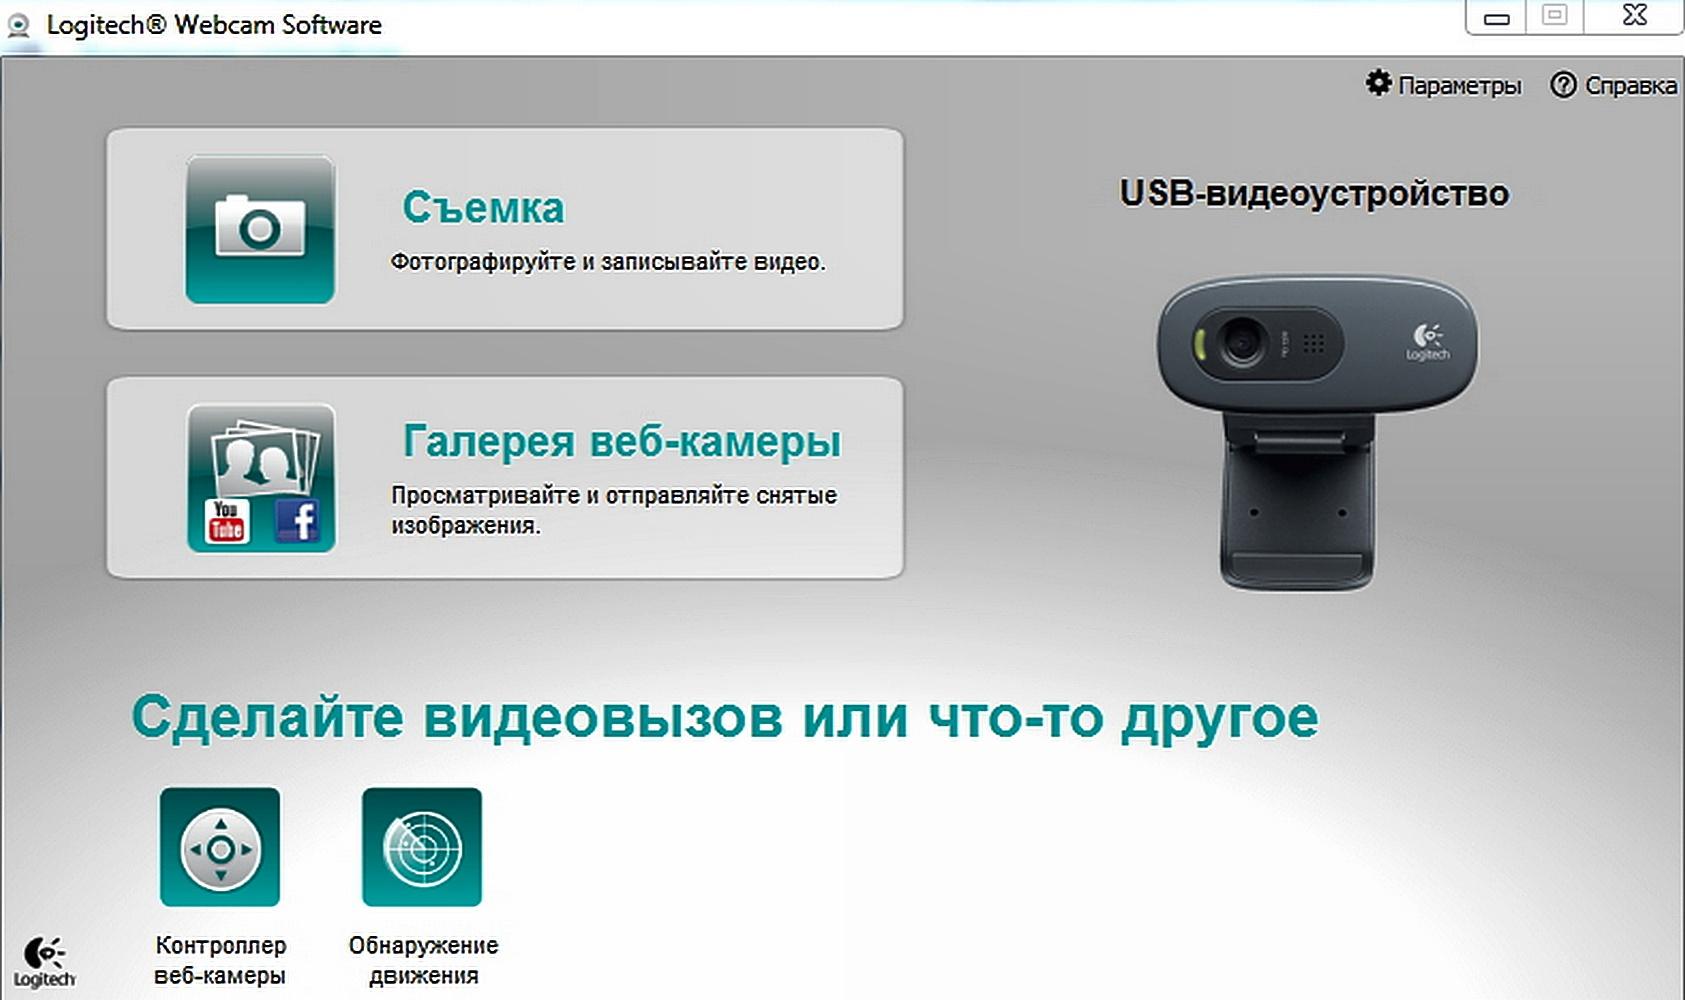 Скачать драйвера на web камеру denn